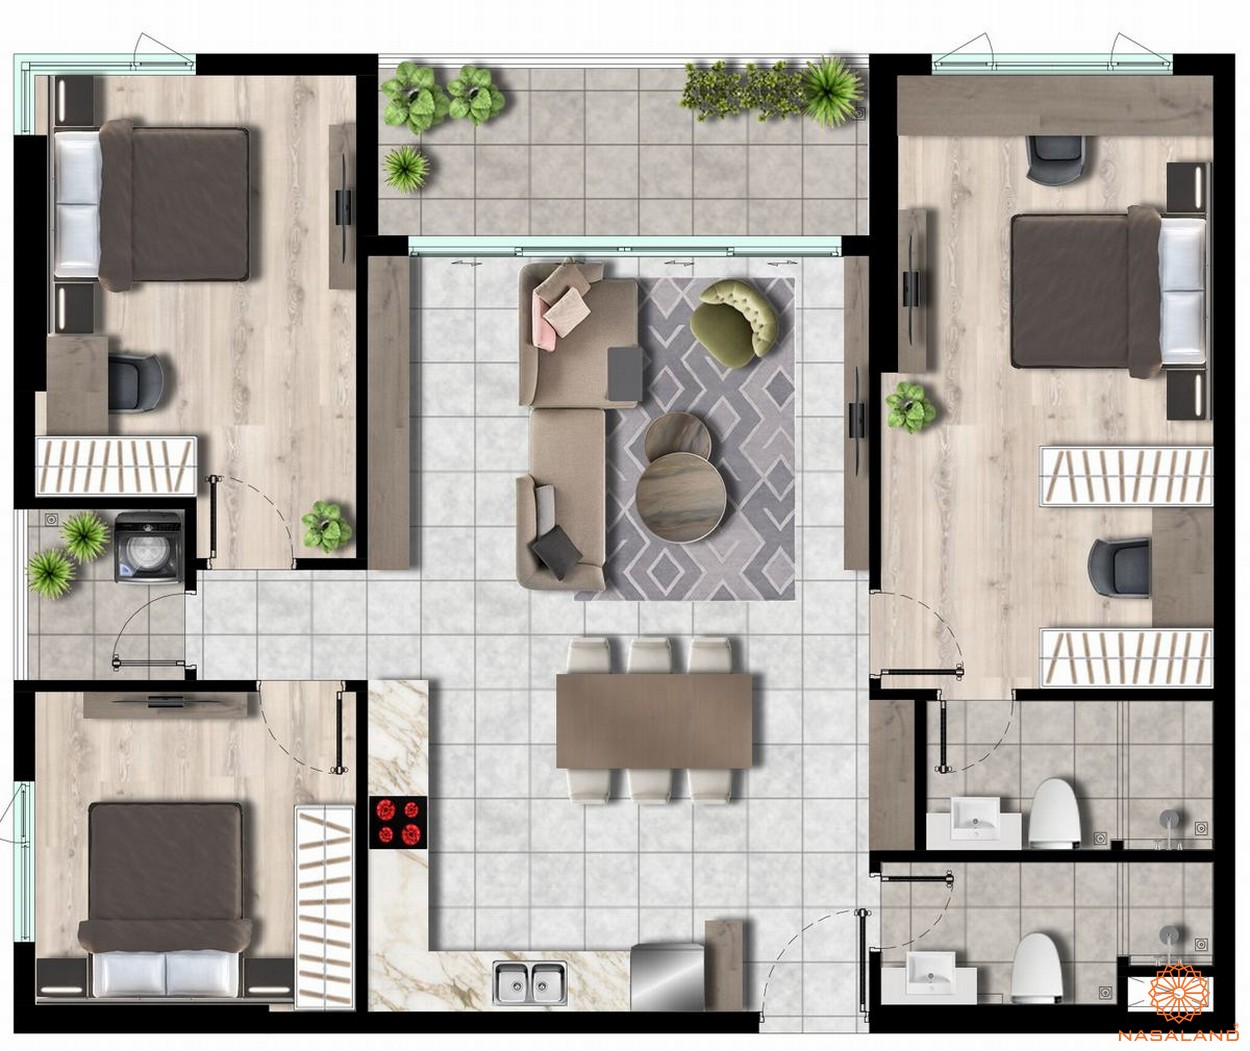 Thiết kế căn-hộ 3pn -2wc 113m2 West Gate